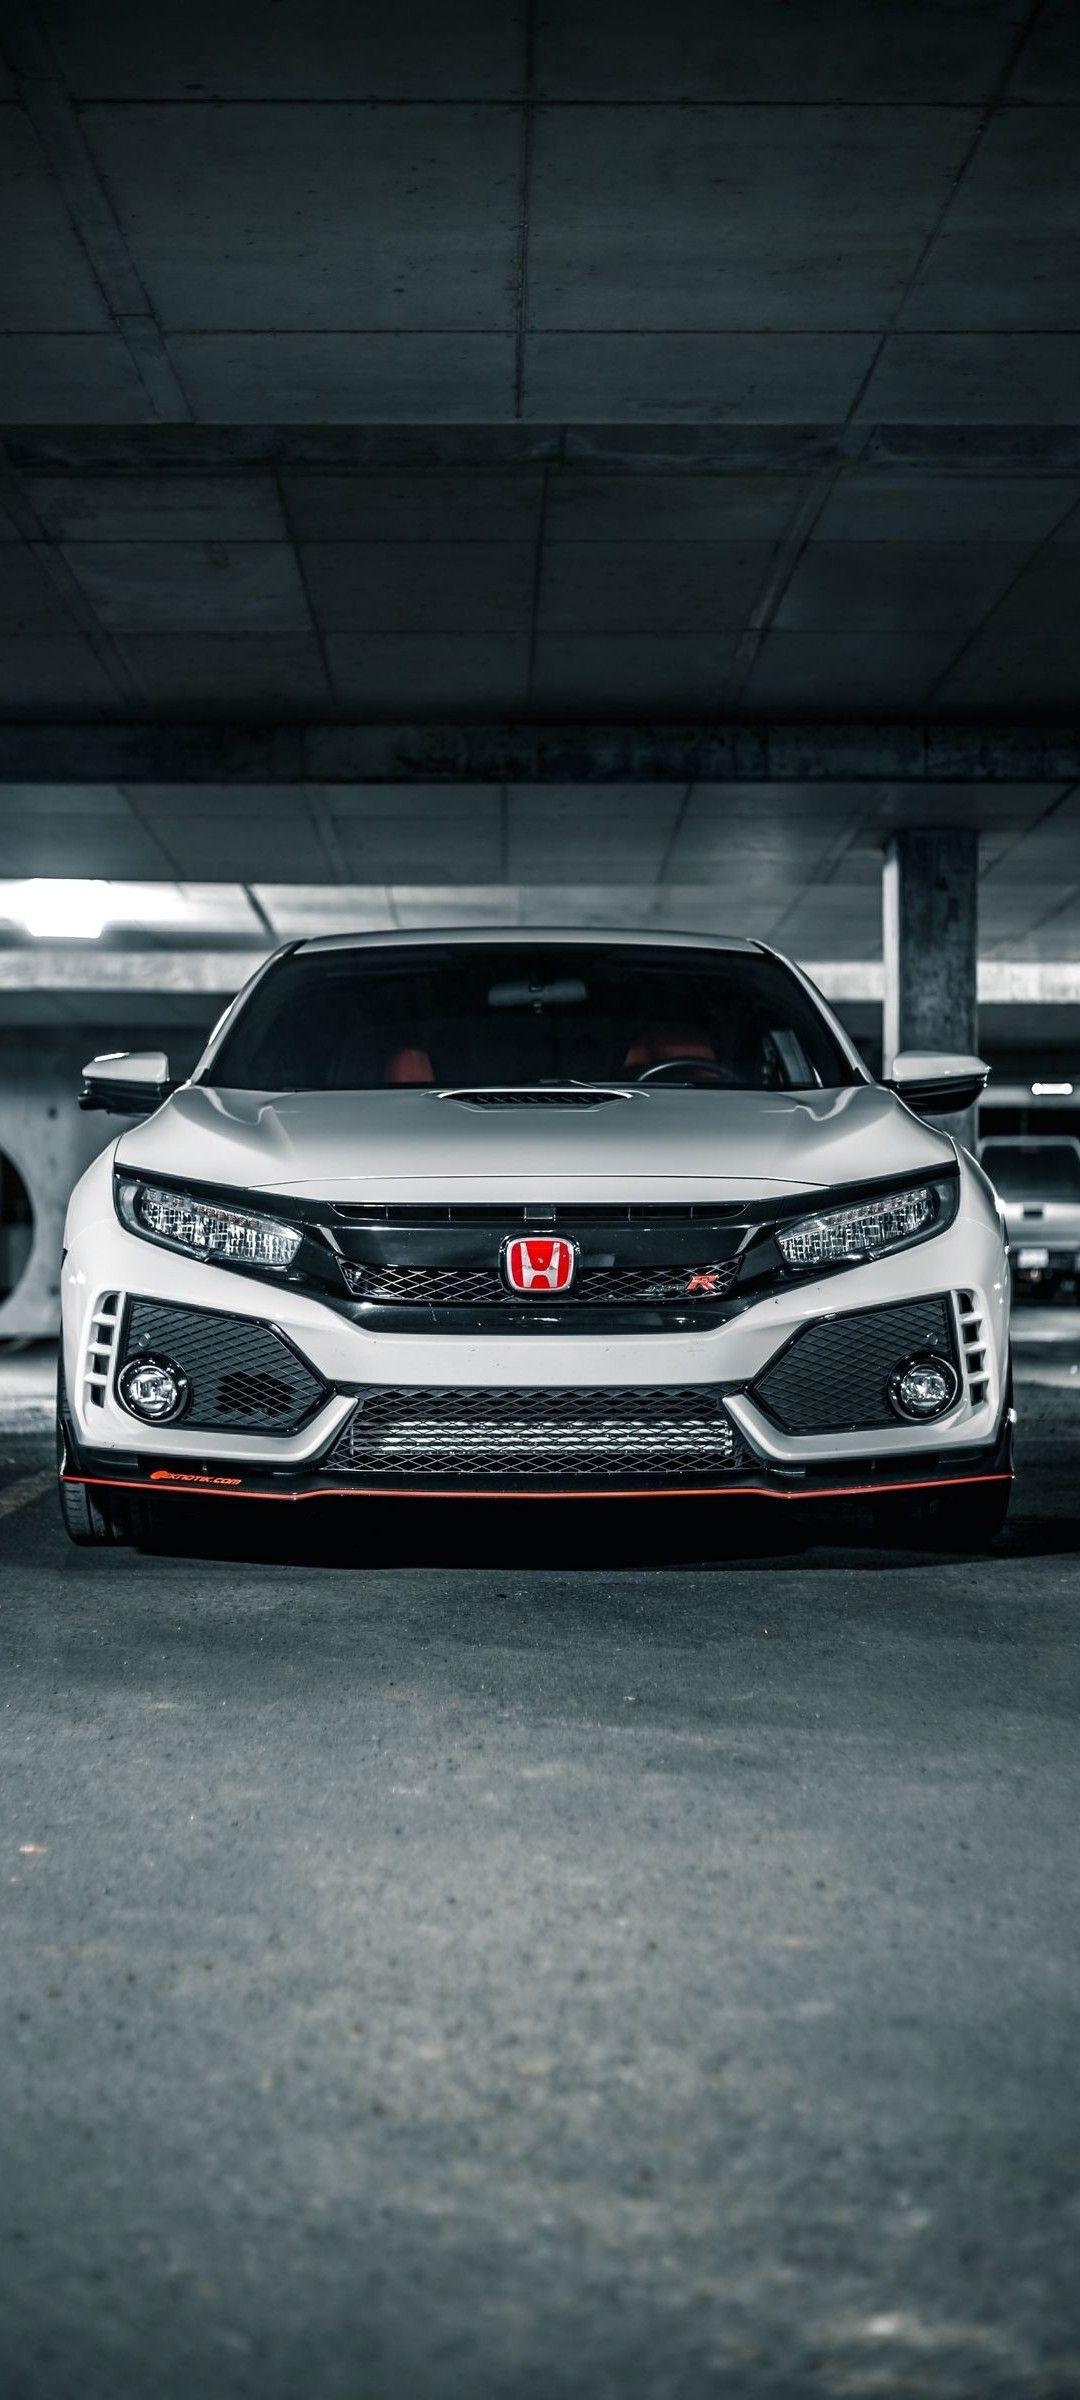 Honda FIT HD Wallpaper